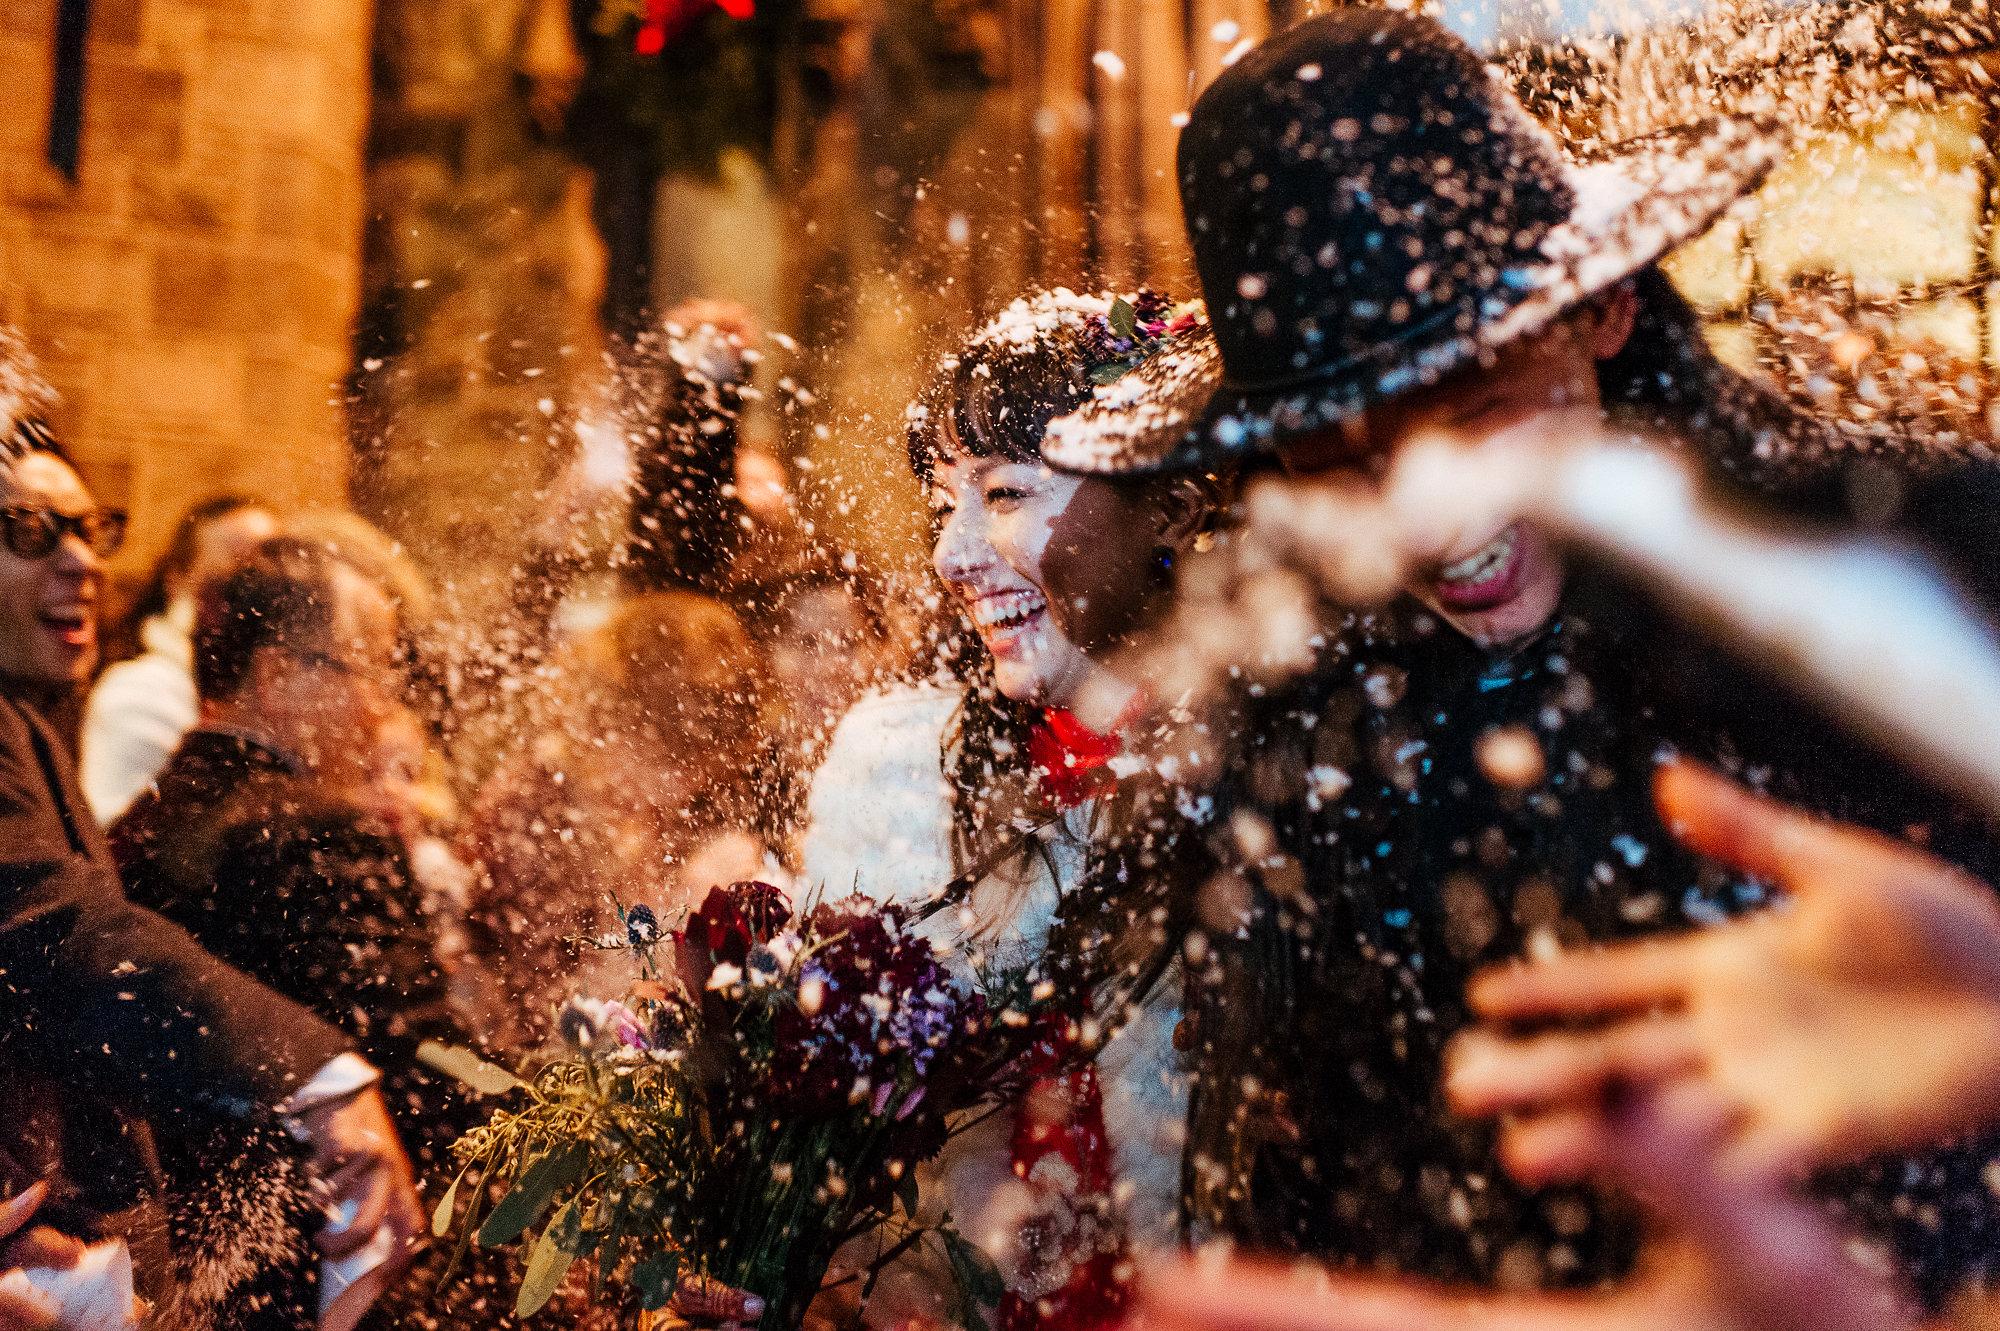 wedding_dancing_fun47.JPG